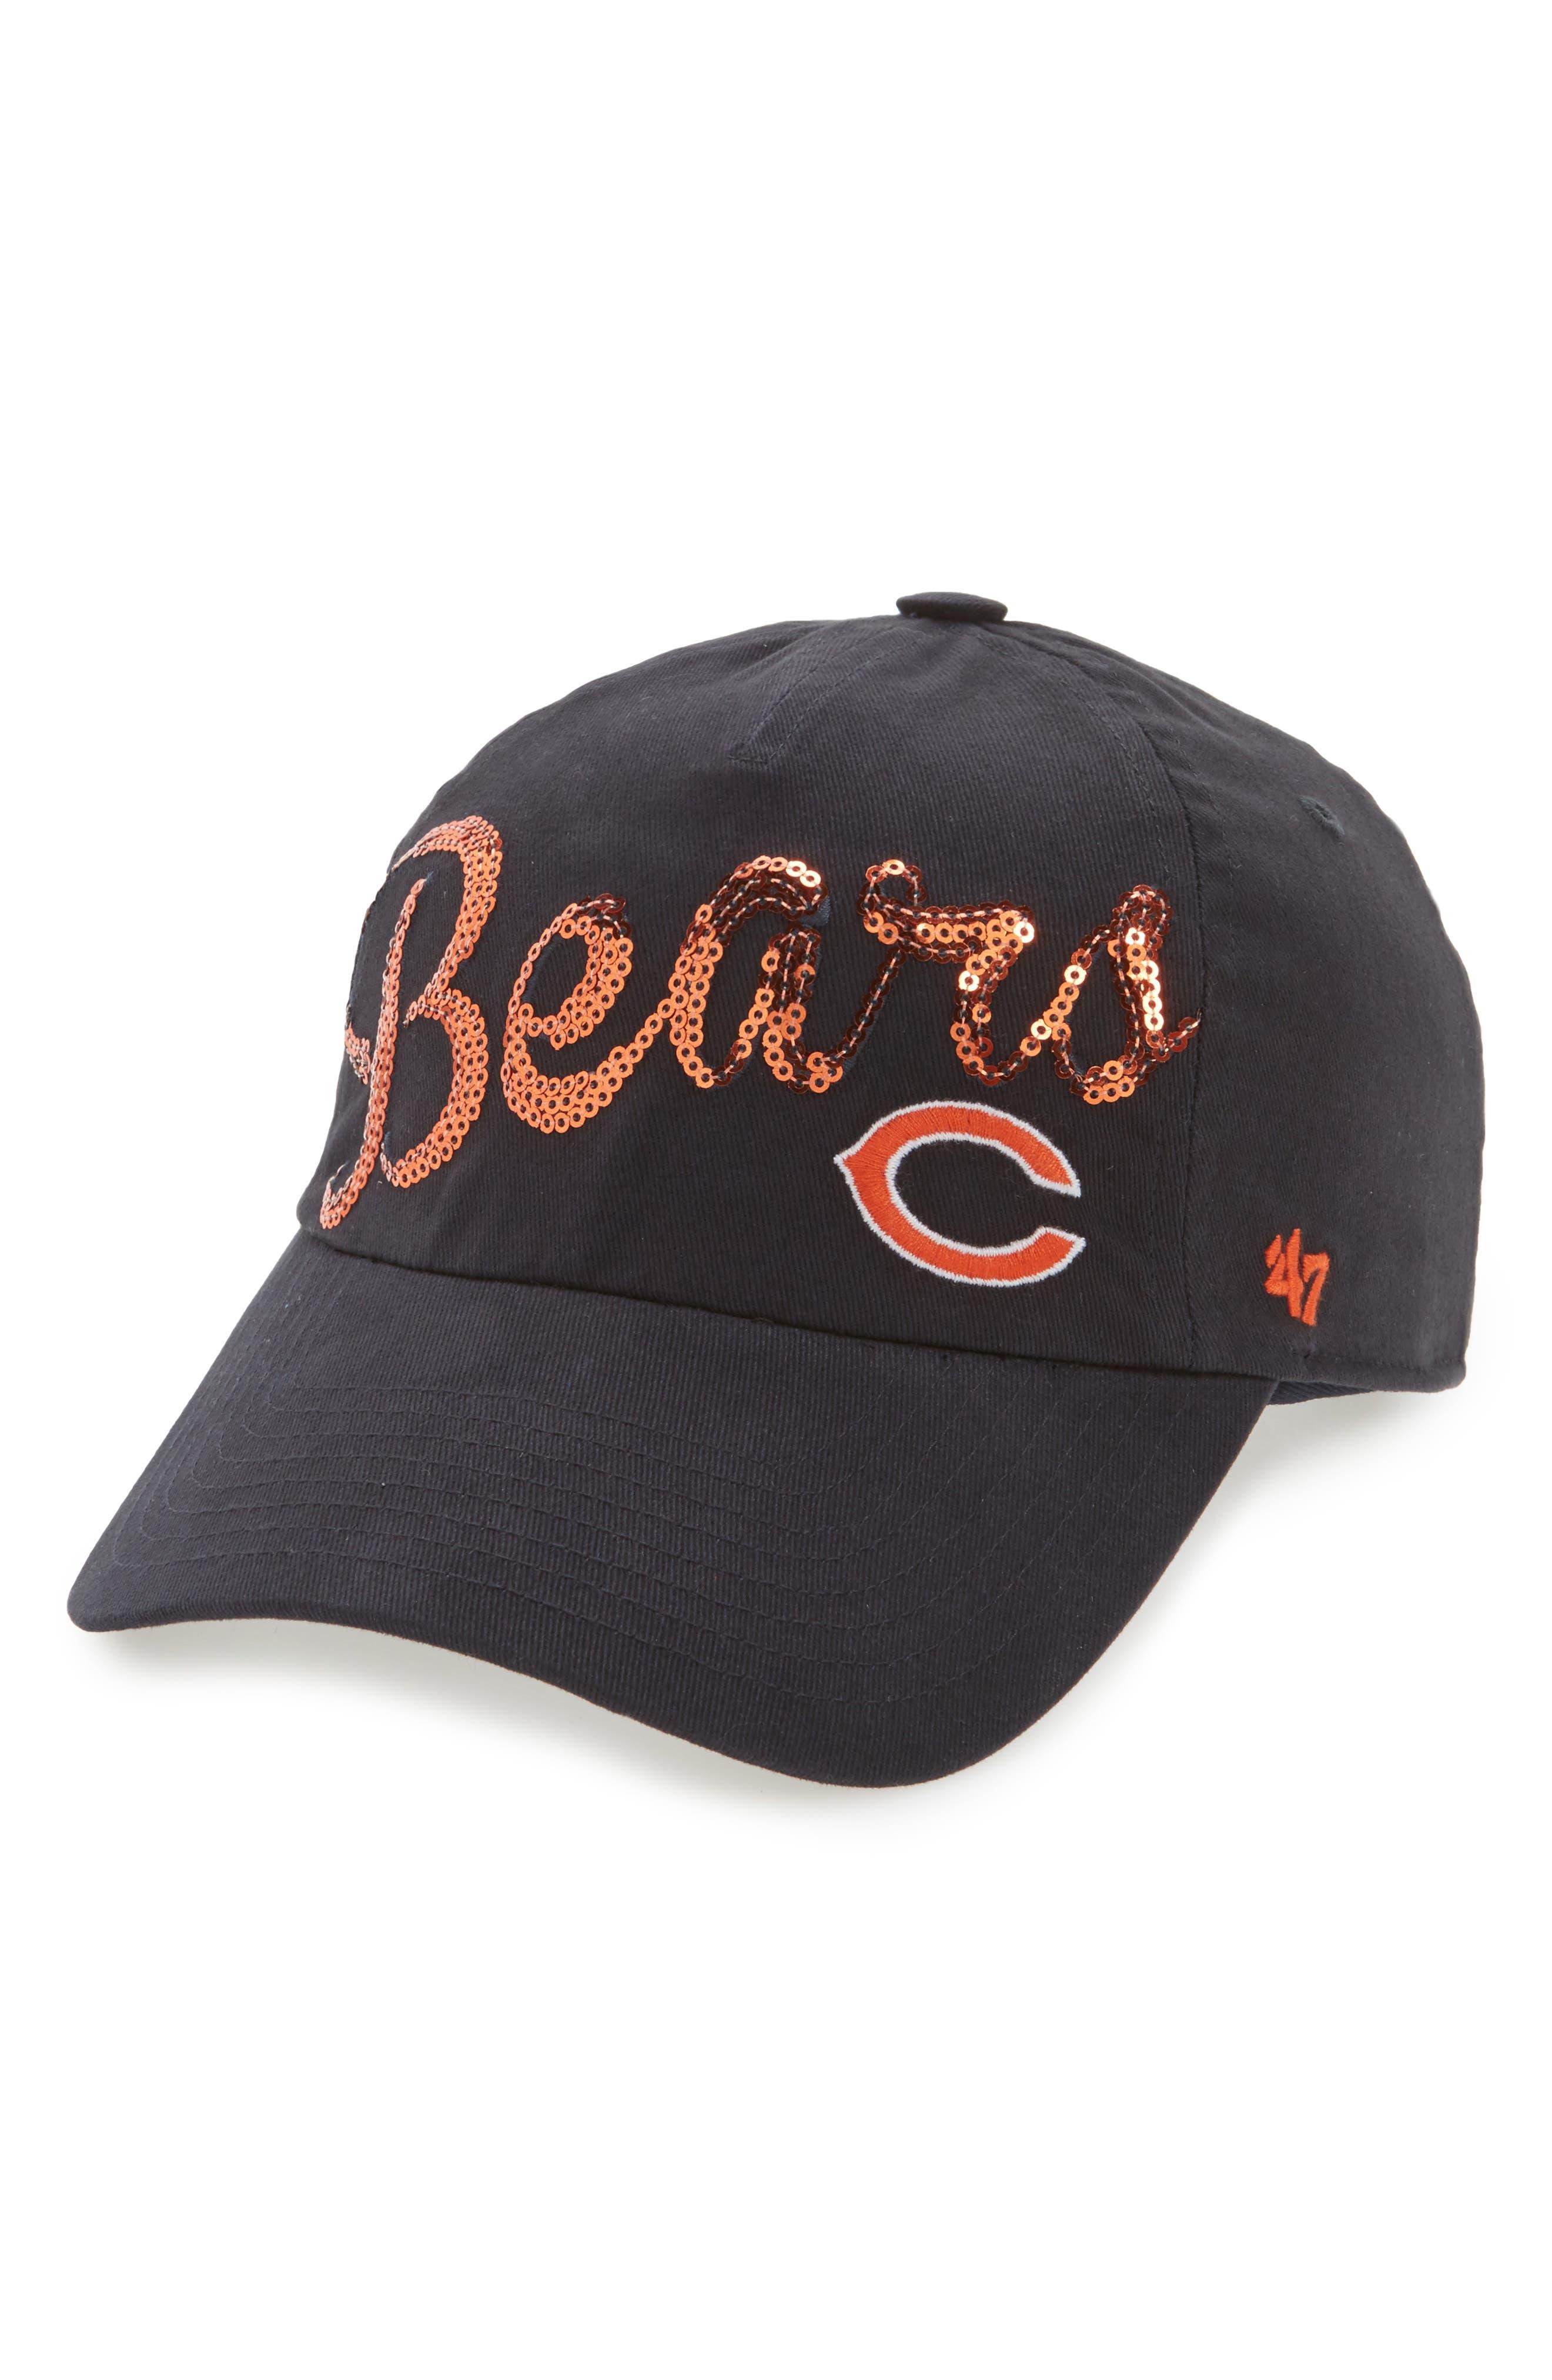 Main Image - '47 Chicago Bears Sparkle Cap